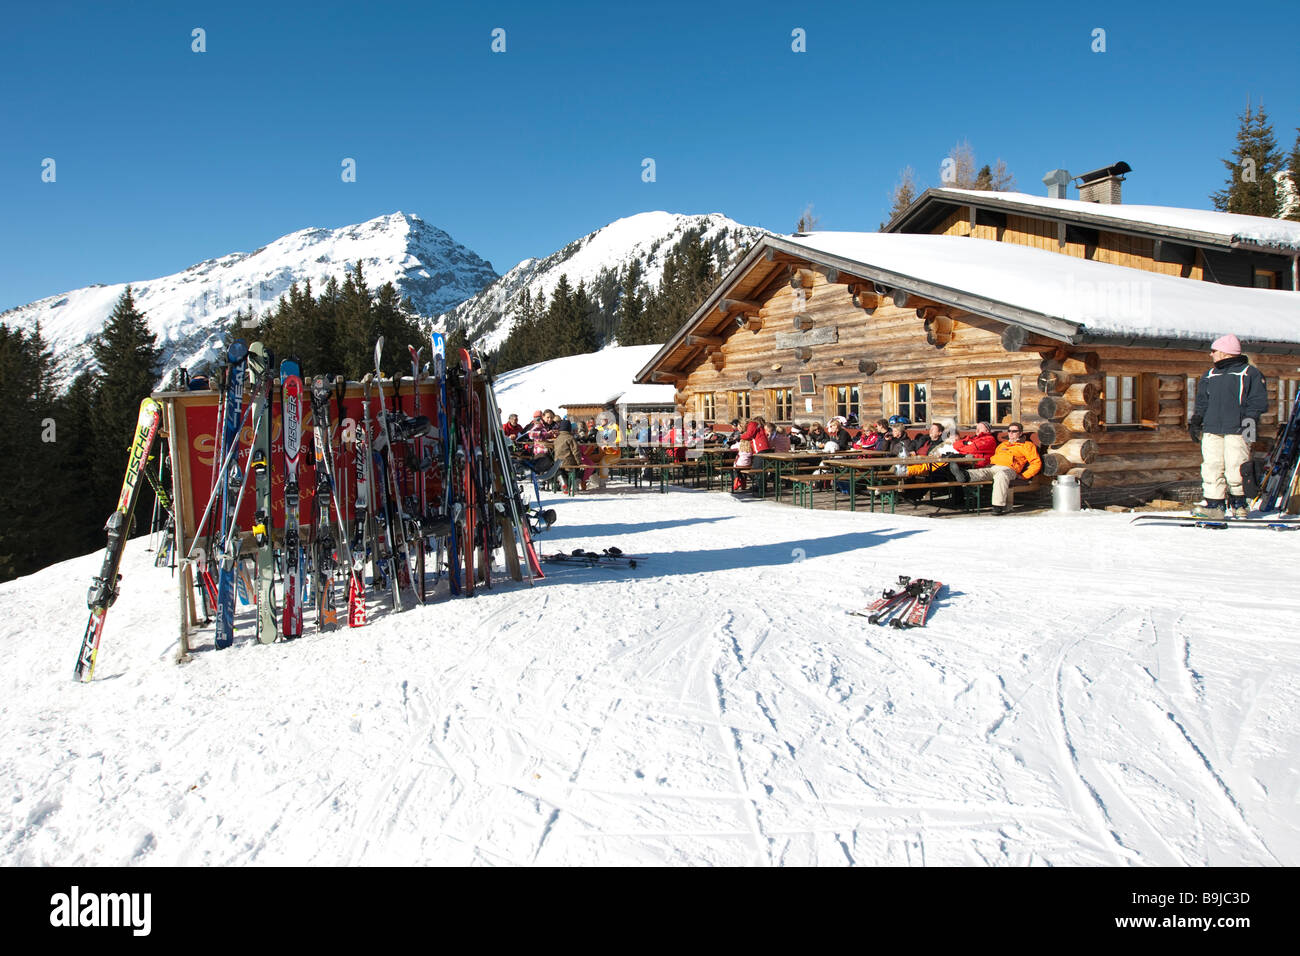 Skis standing on the Heitwanger Hochalm mountain pasture, Bichelbach, Tyrol, Austria, Europe Stock Photo